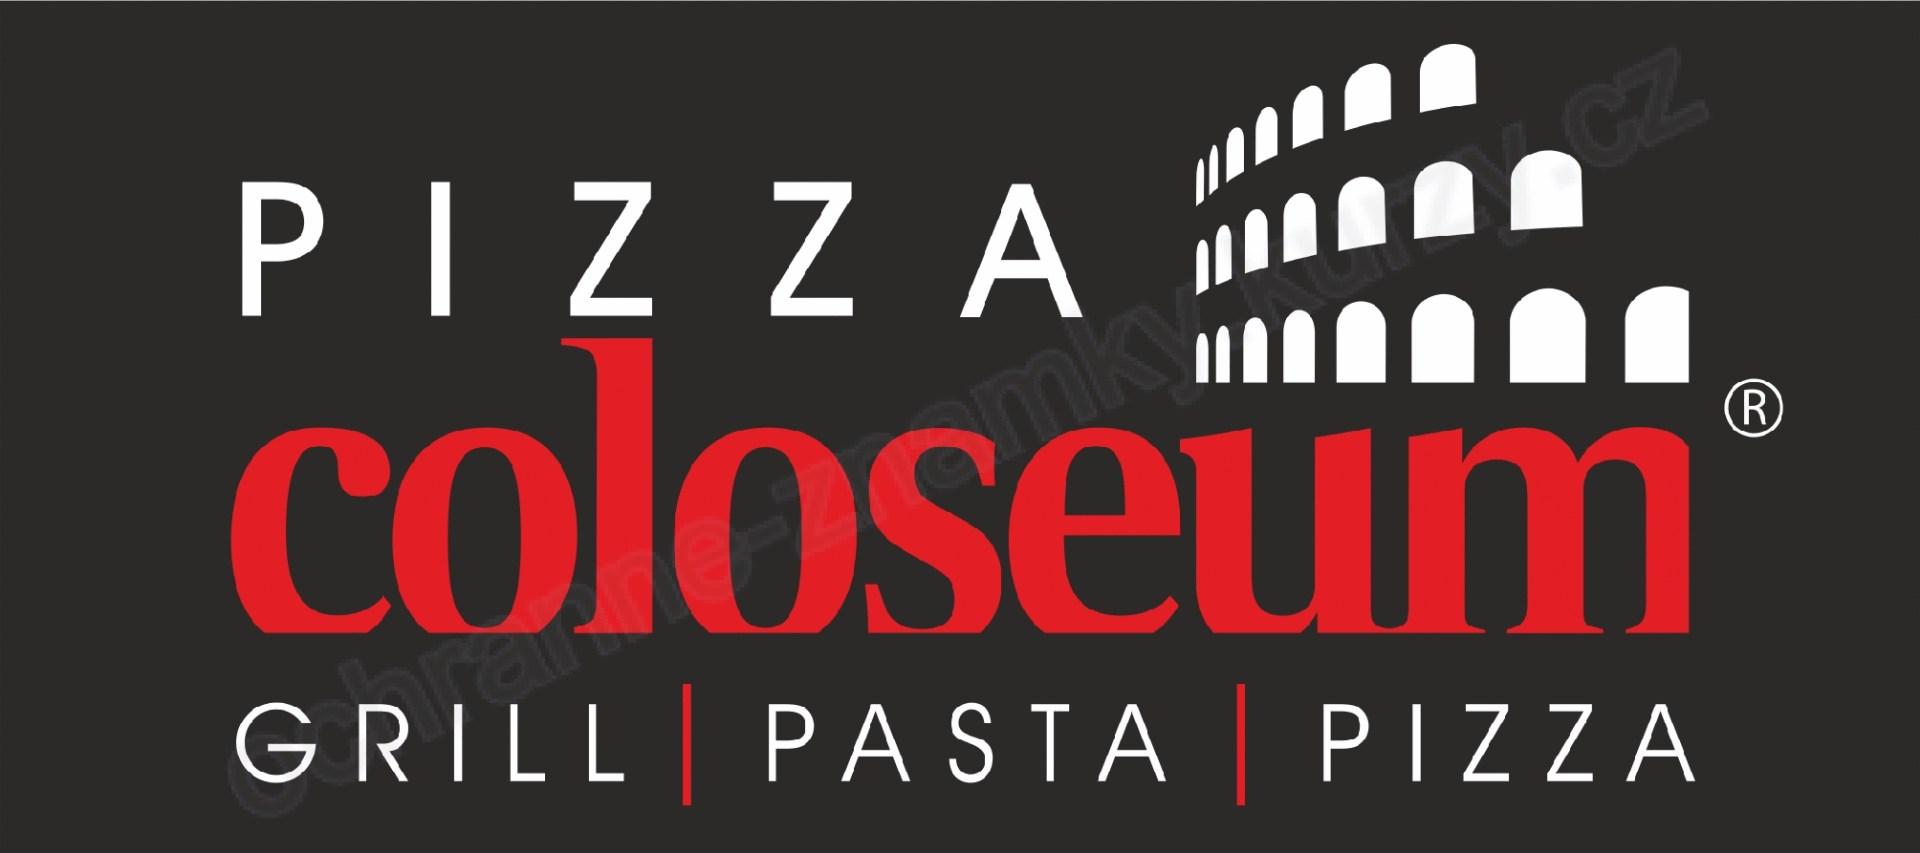 pizza coloseum